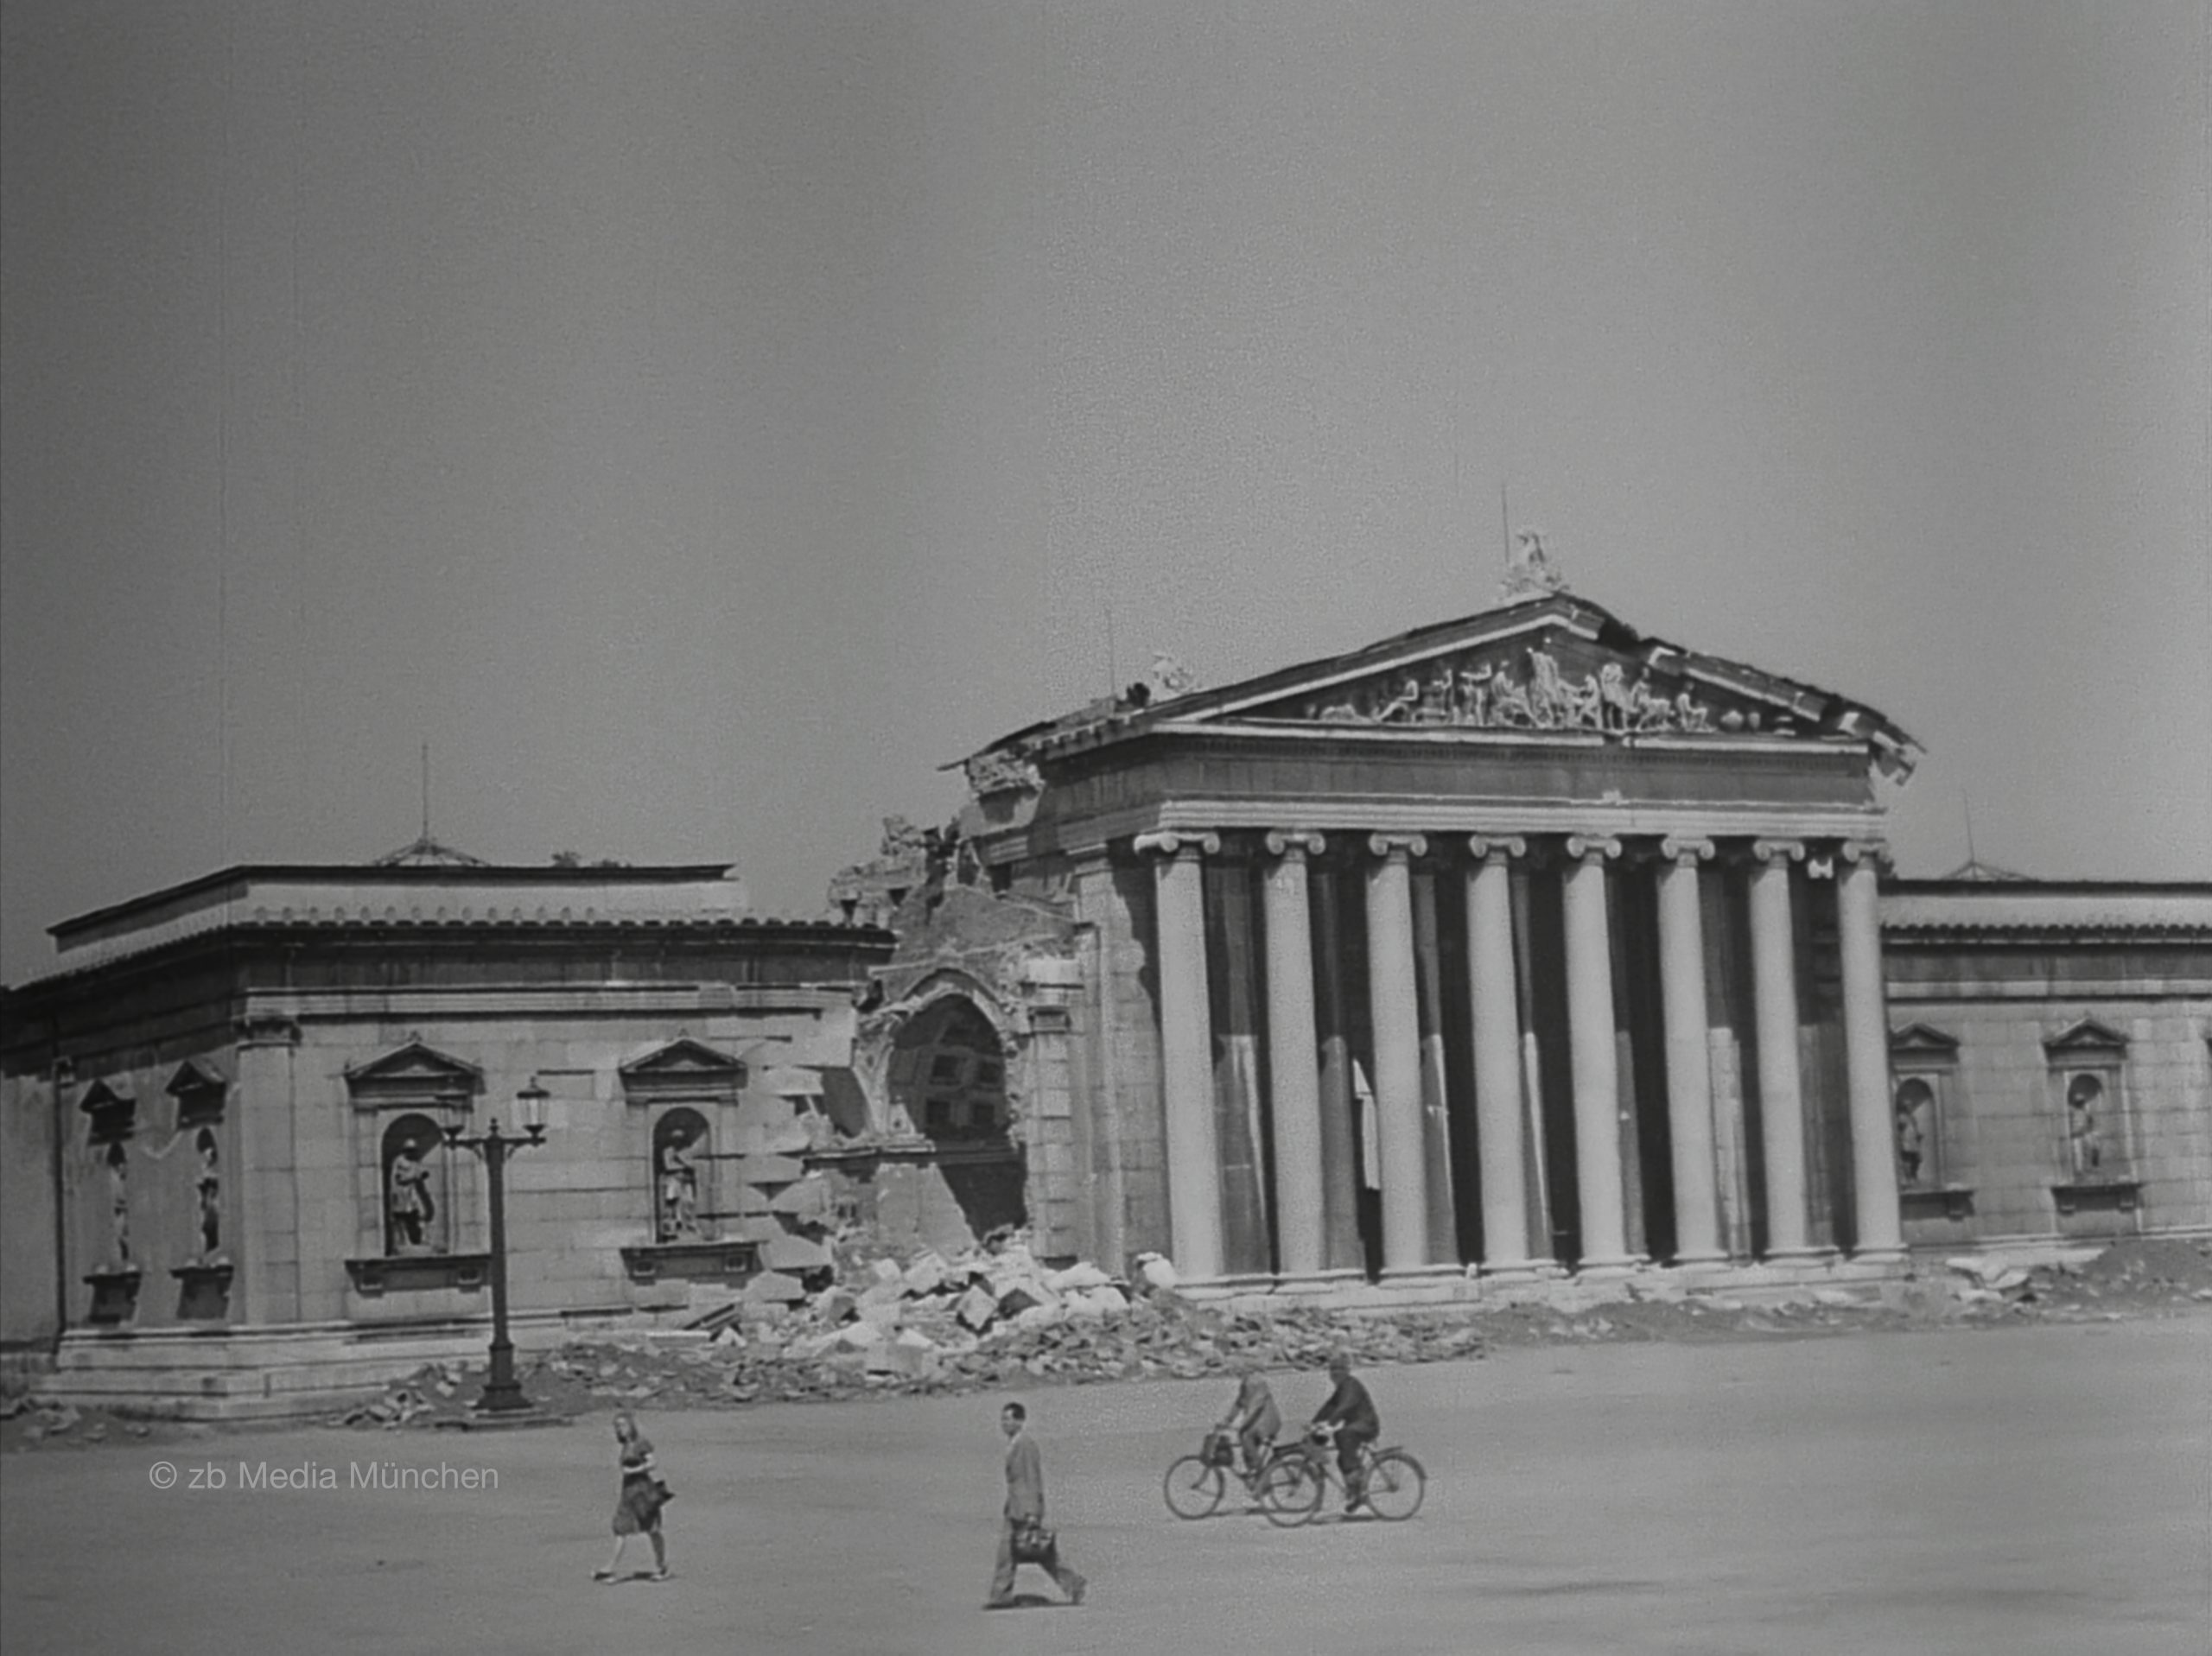 Antikensammlung, München 1. Mai 1945